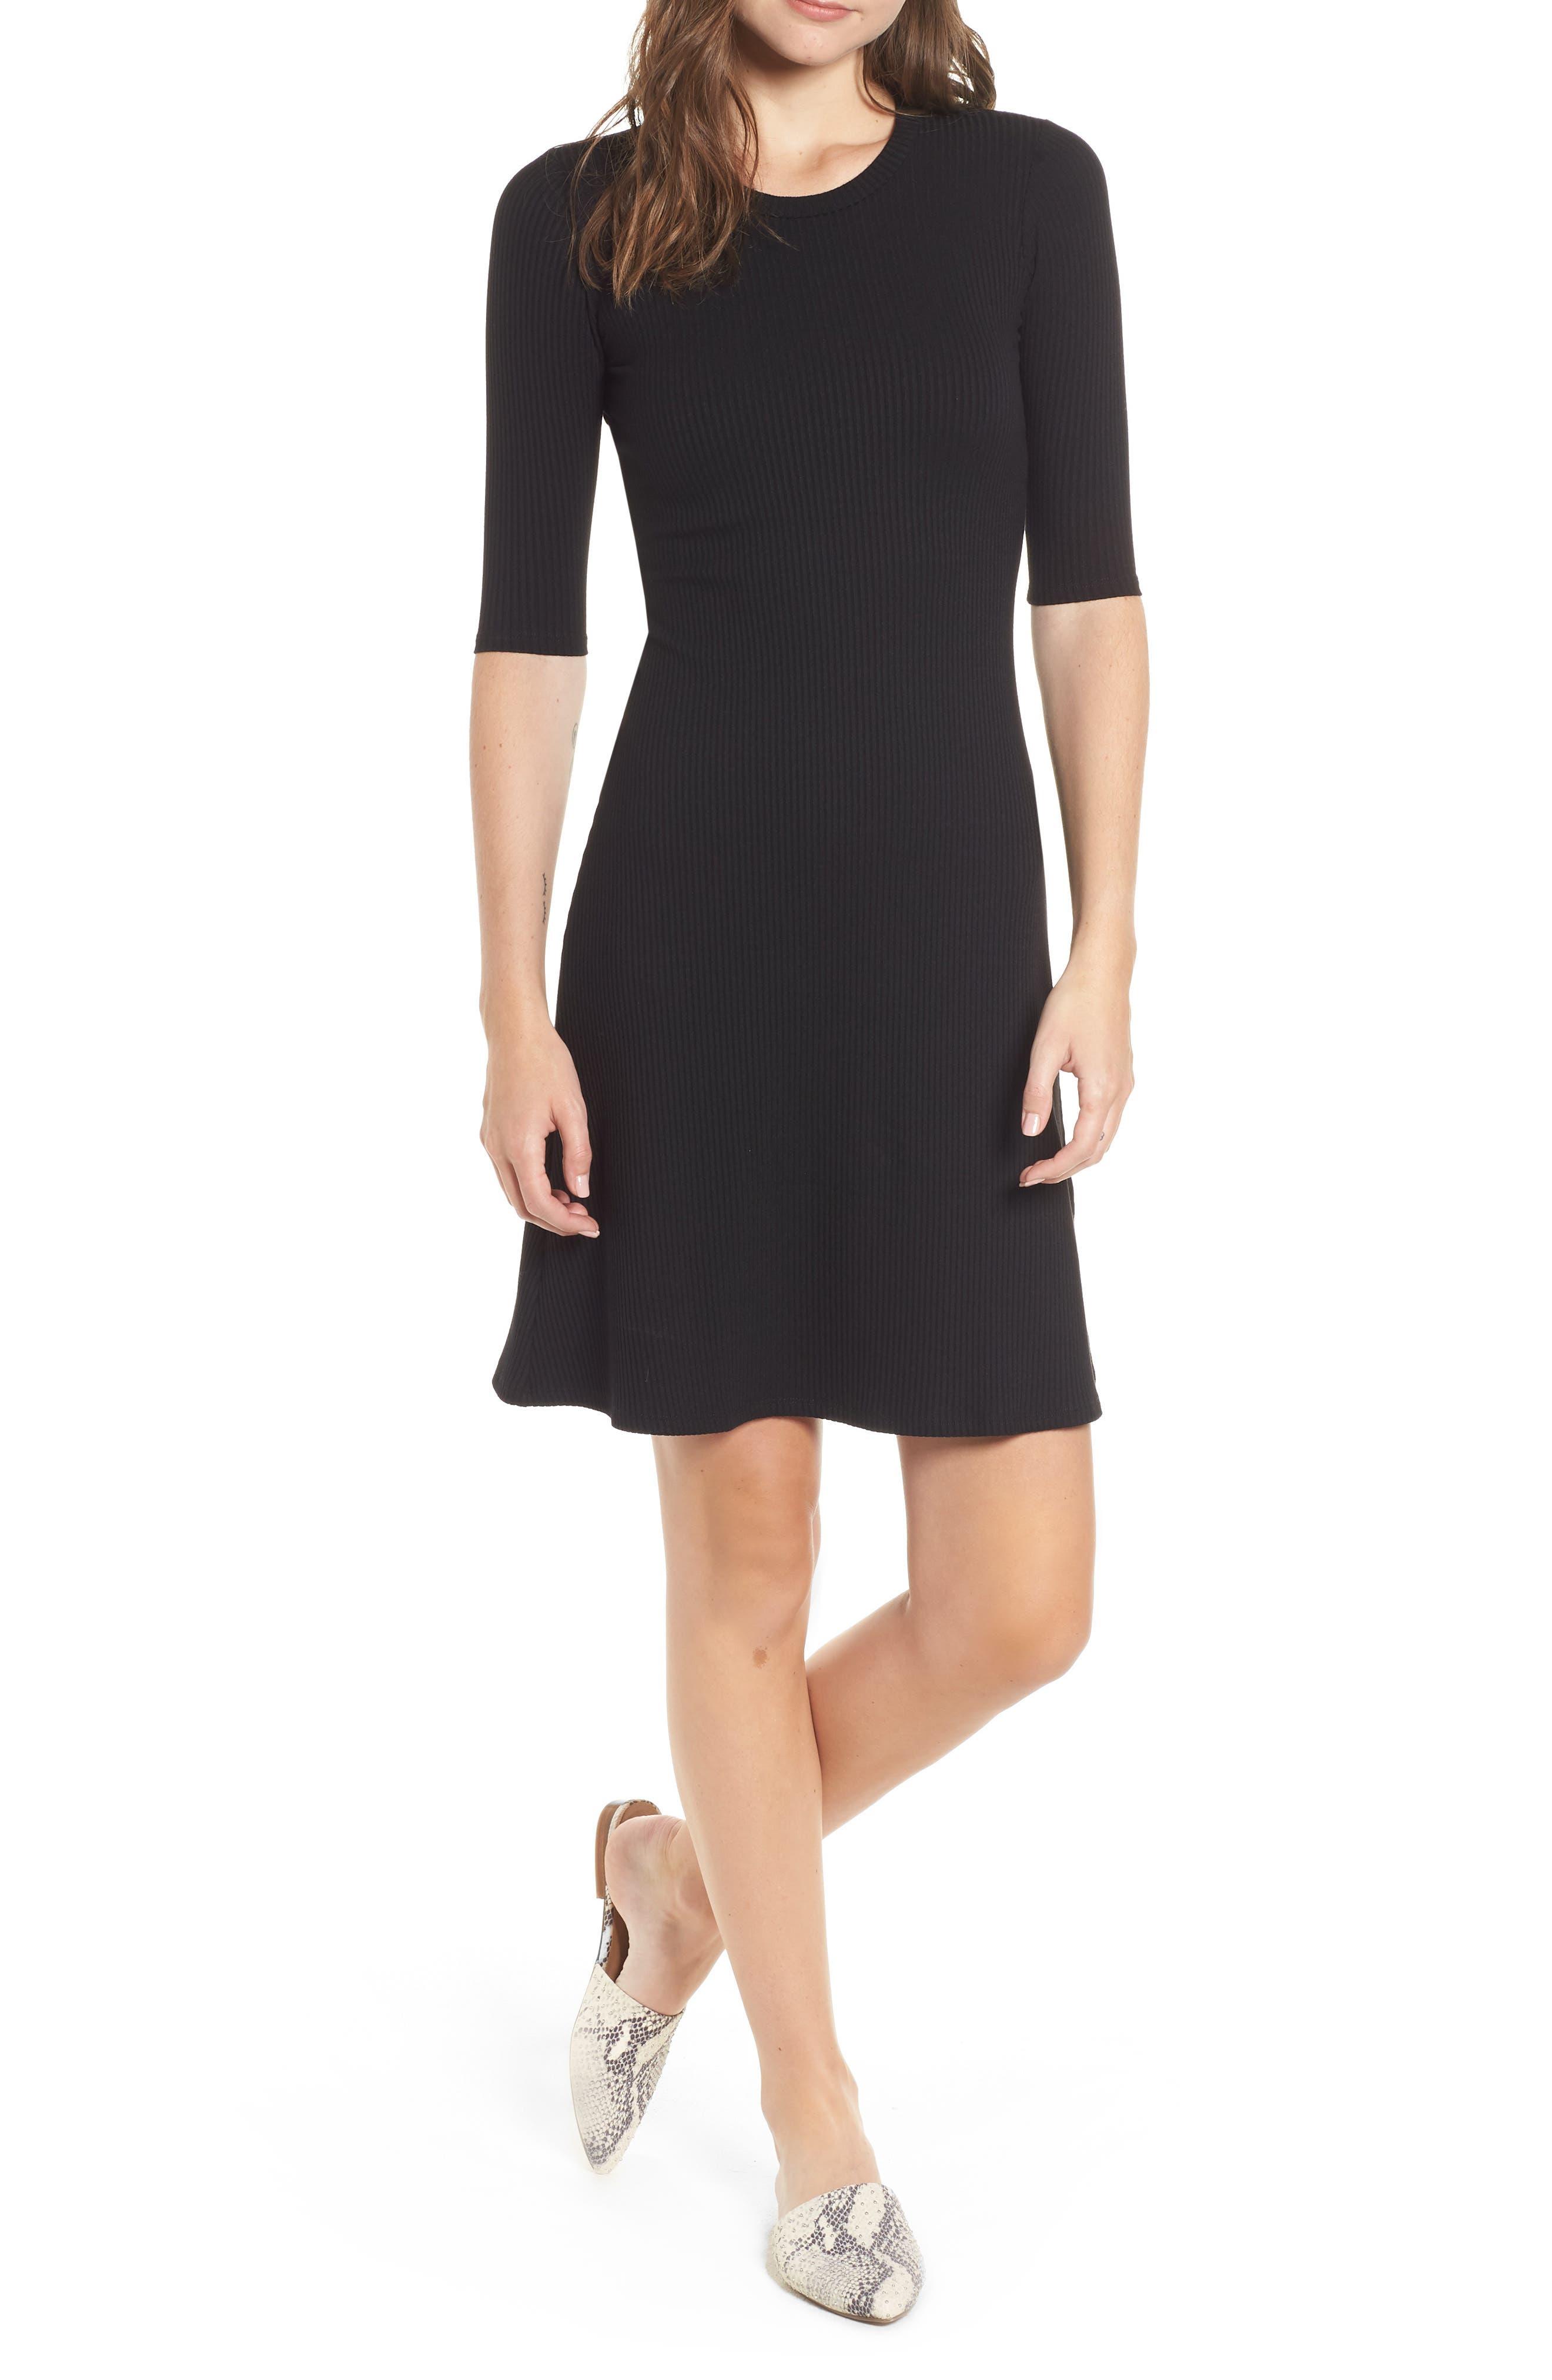 Amour Vert Marilyn Rib Fit & Flare Dress, Black